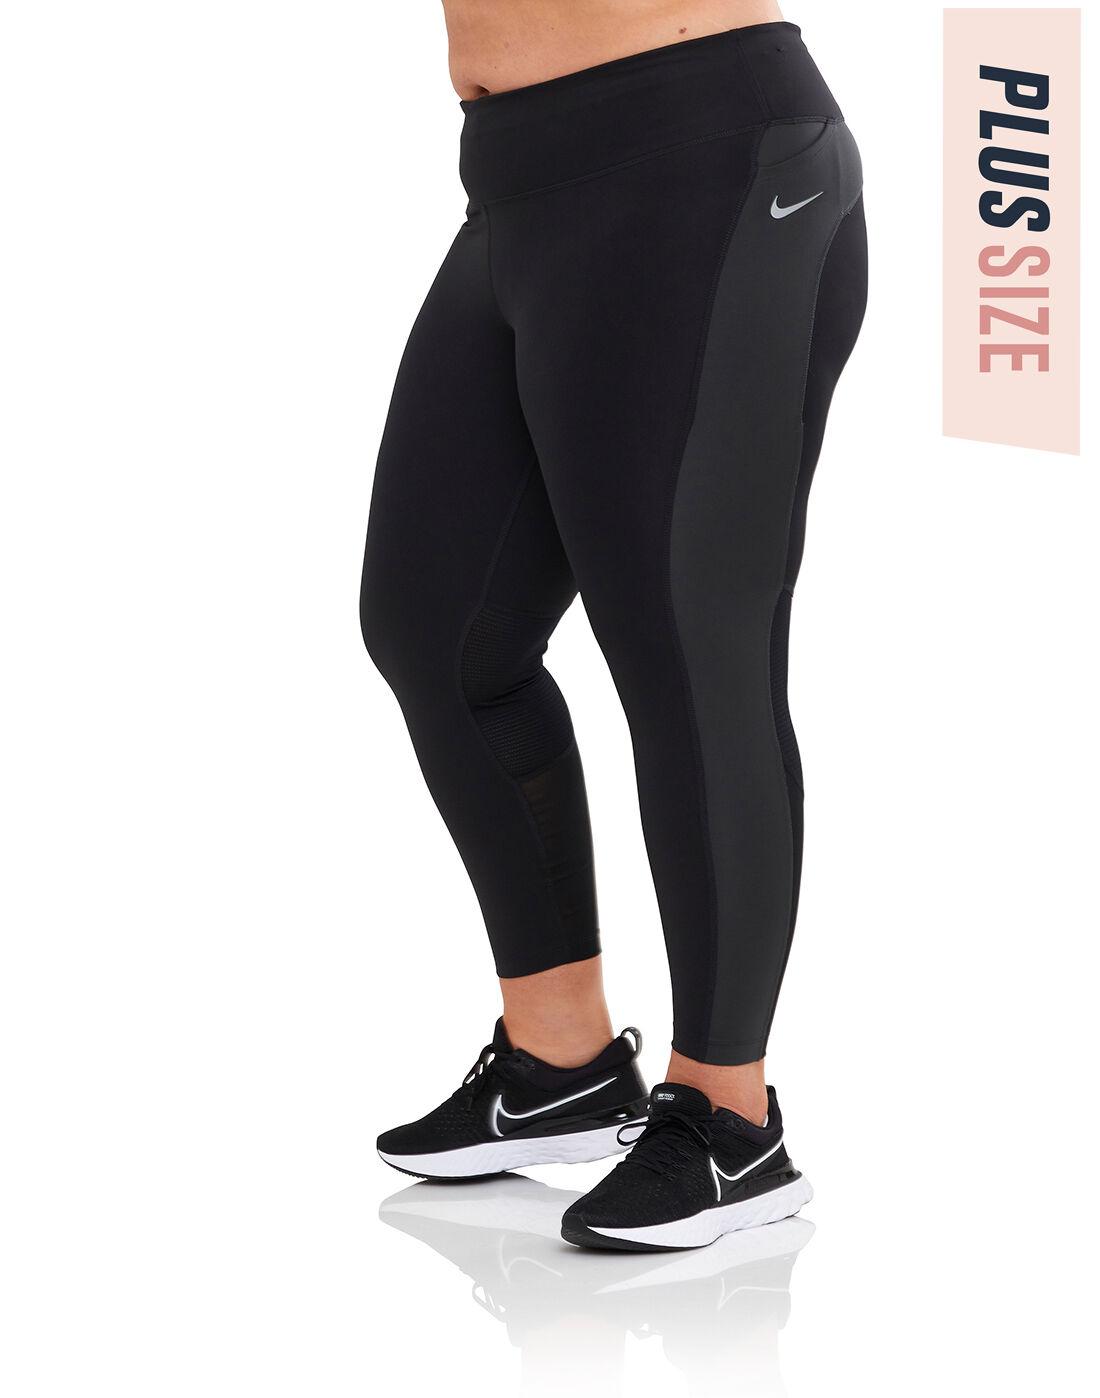 Nike adidas hamburg ice blue house hotel turkey | Womens Epic Fast 7/8 Leggings